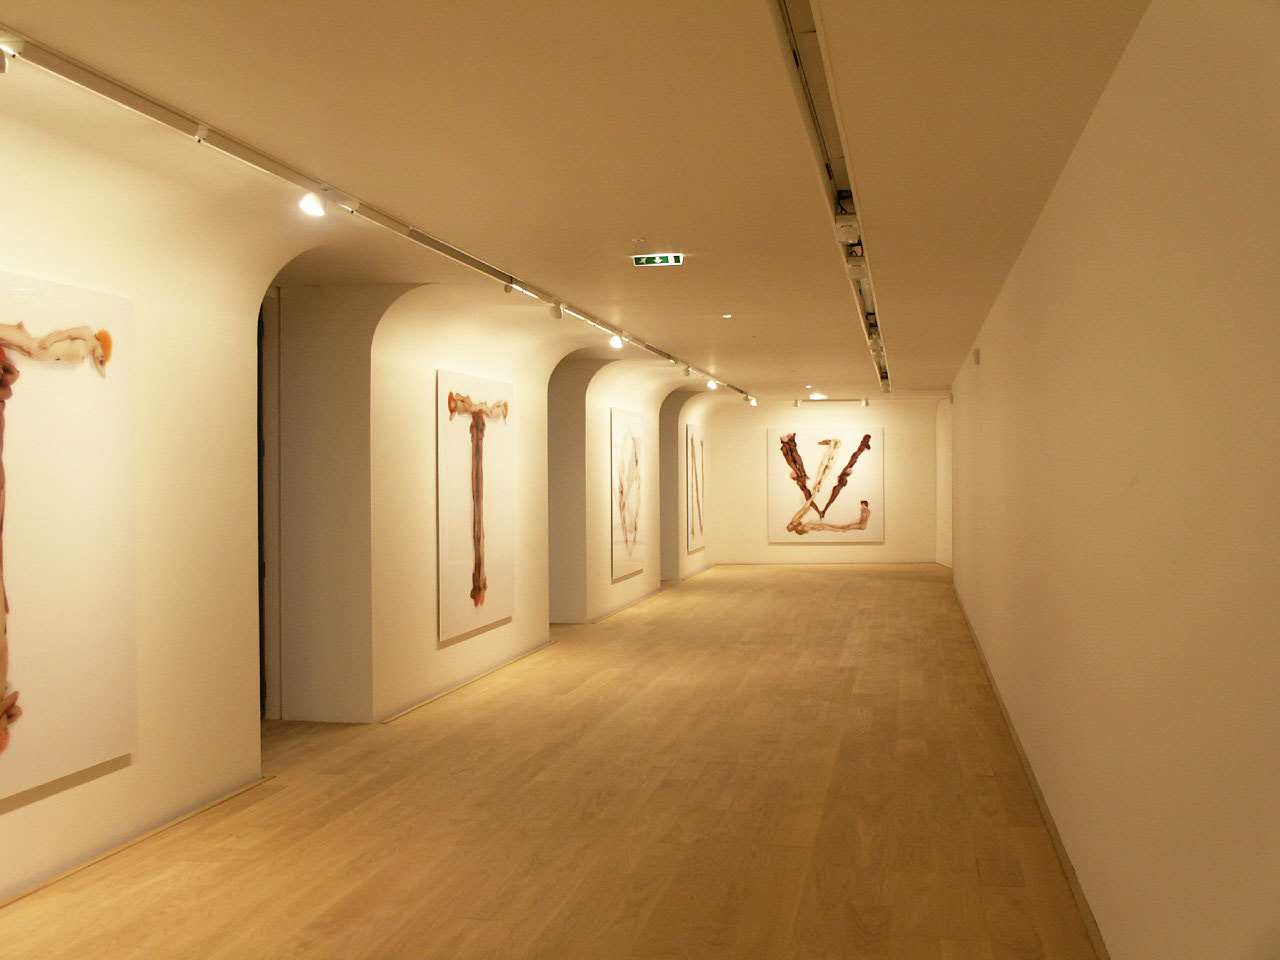 vanessa-beecroft-parigi-alphabet-concept-13